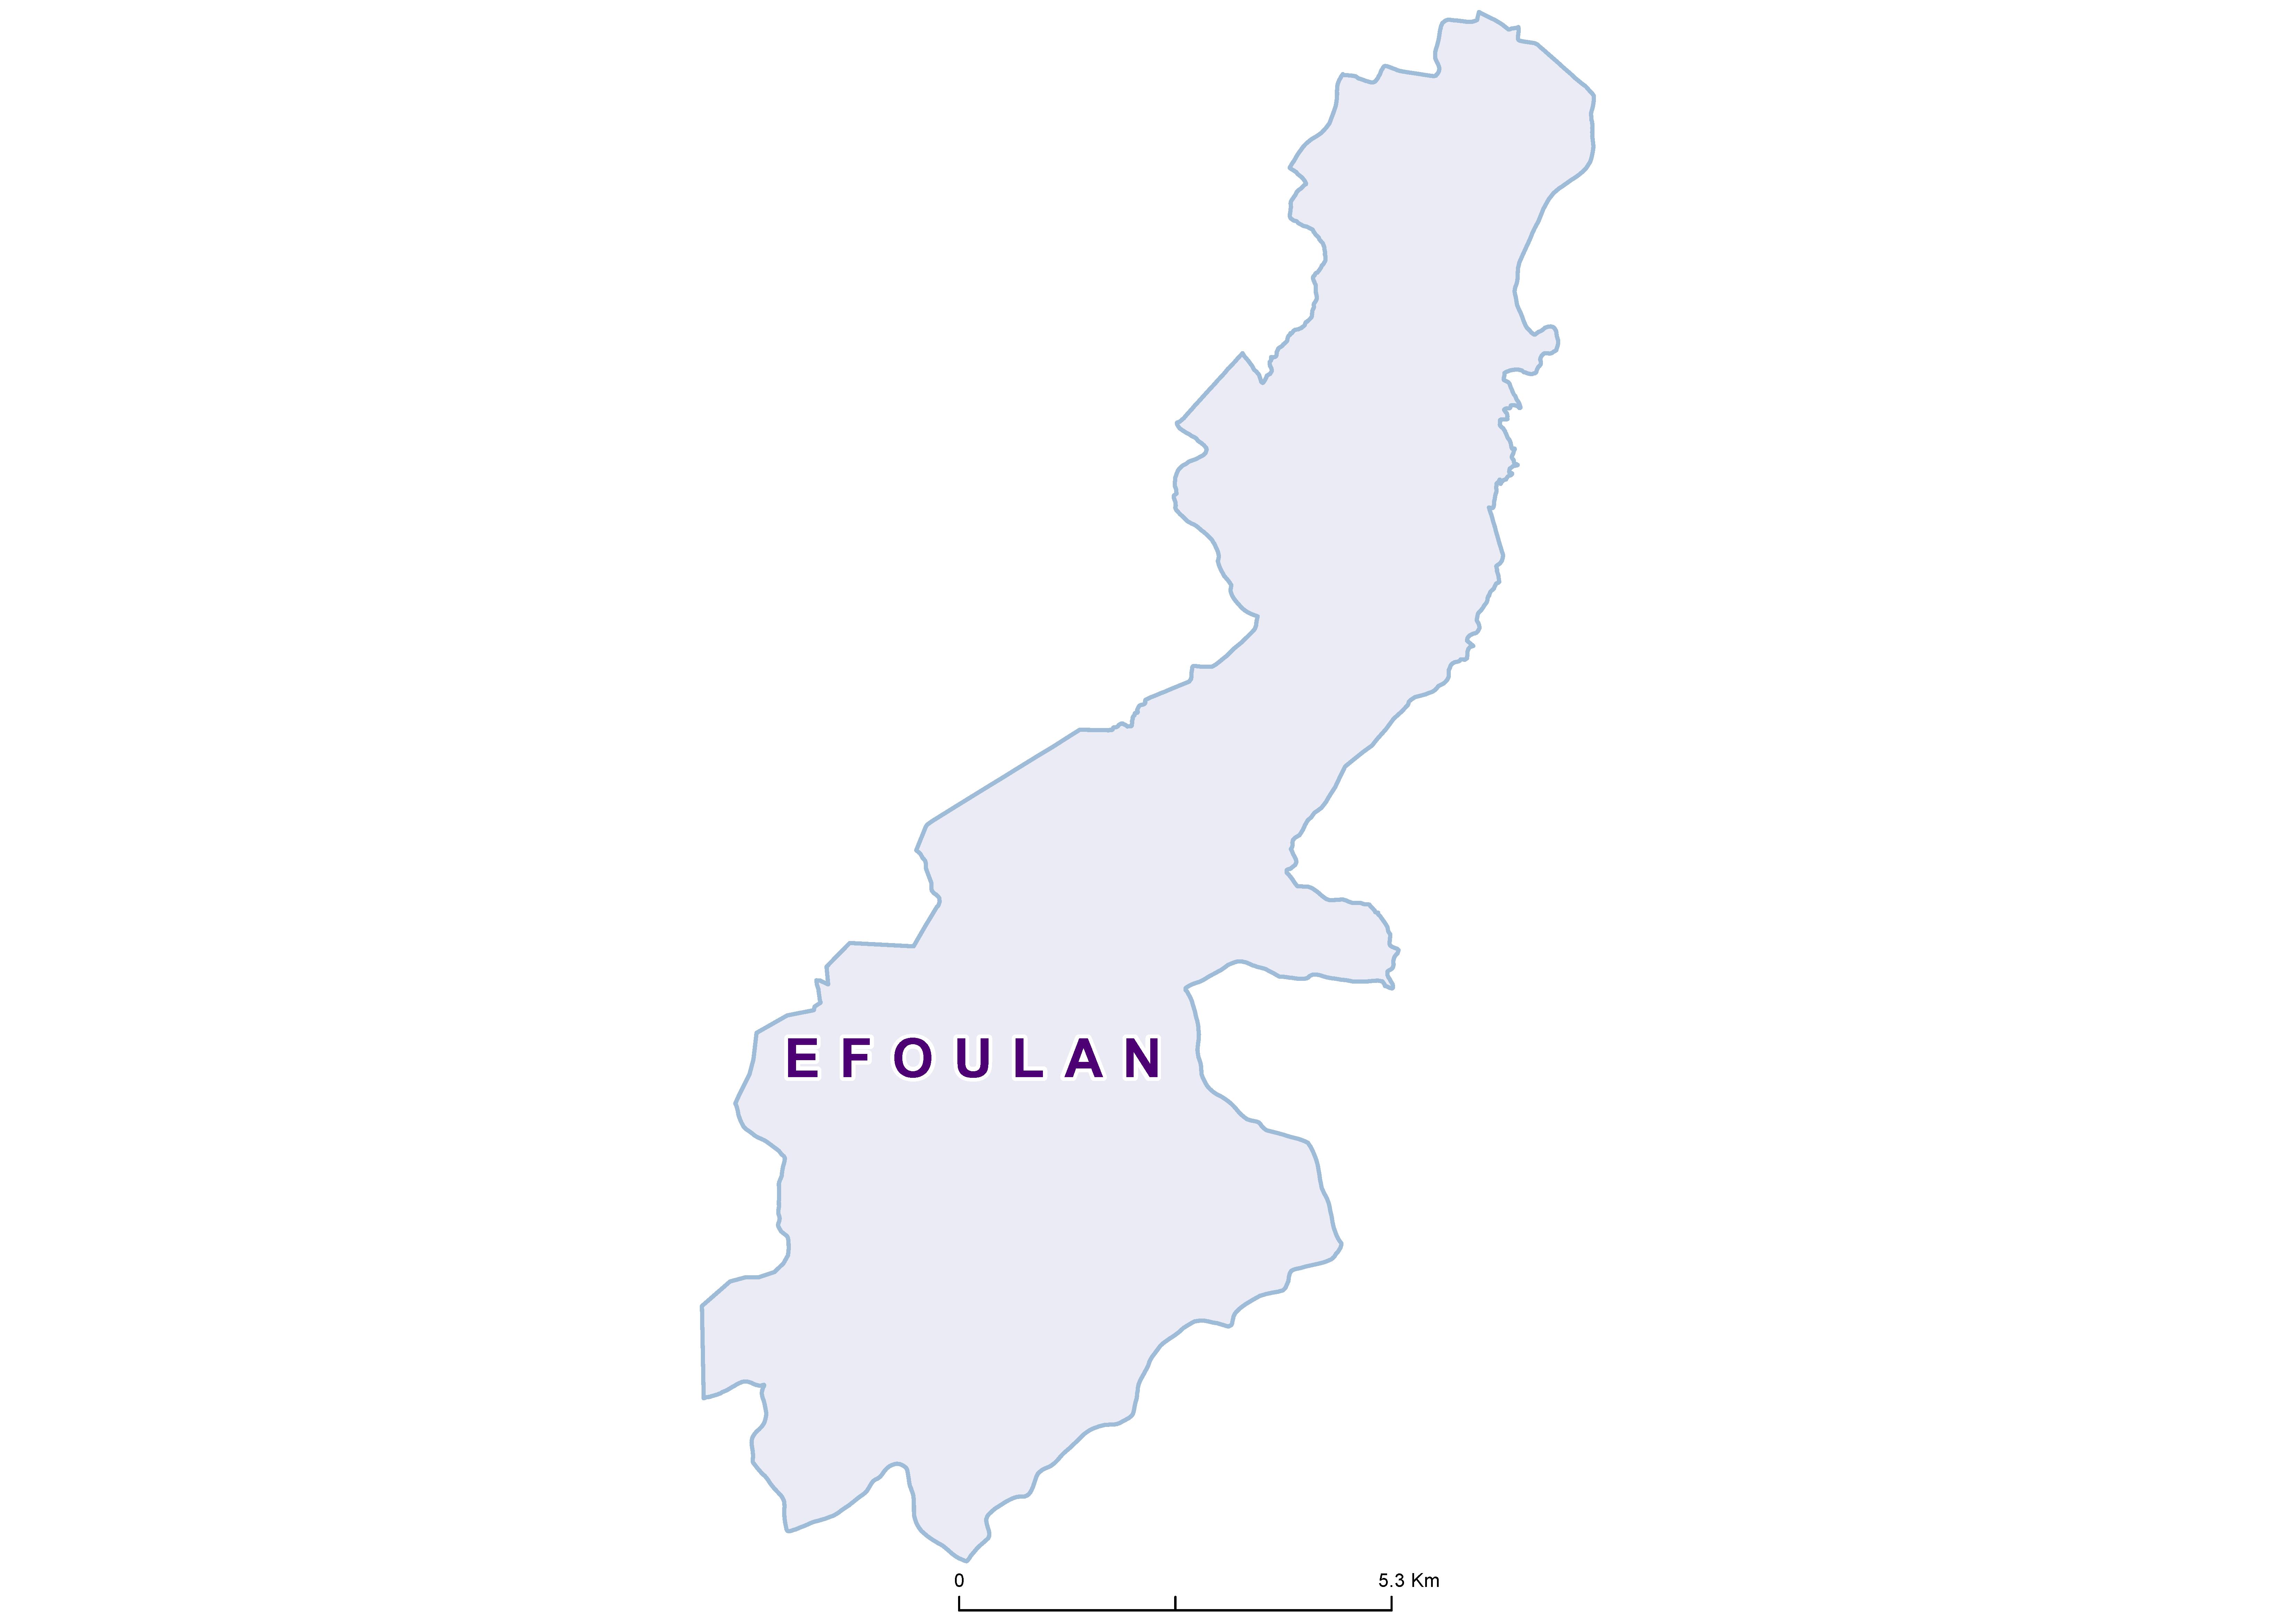 Efoulan Mean STH 19850001